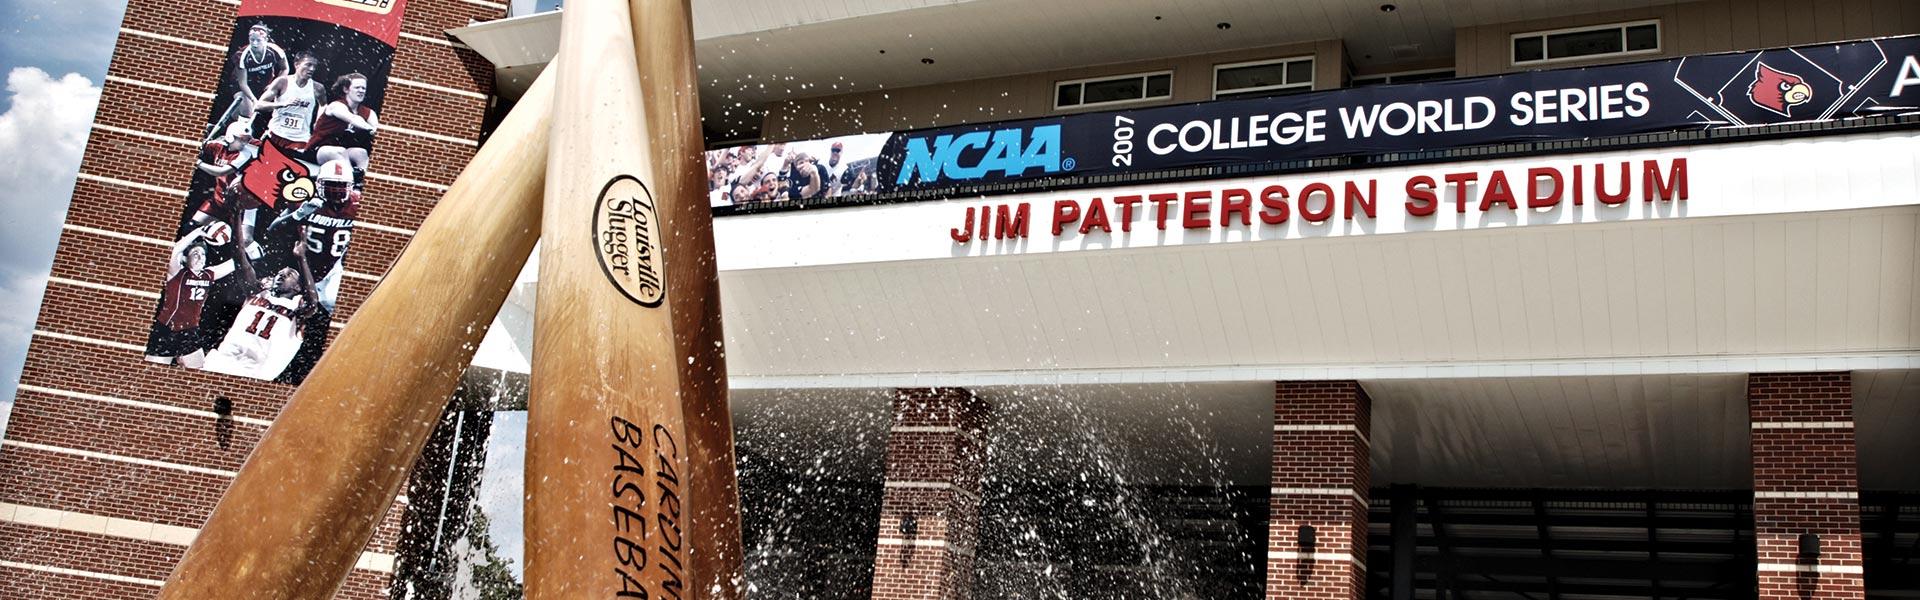 Jim Patterson Stadium